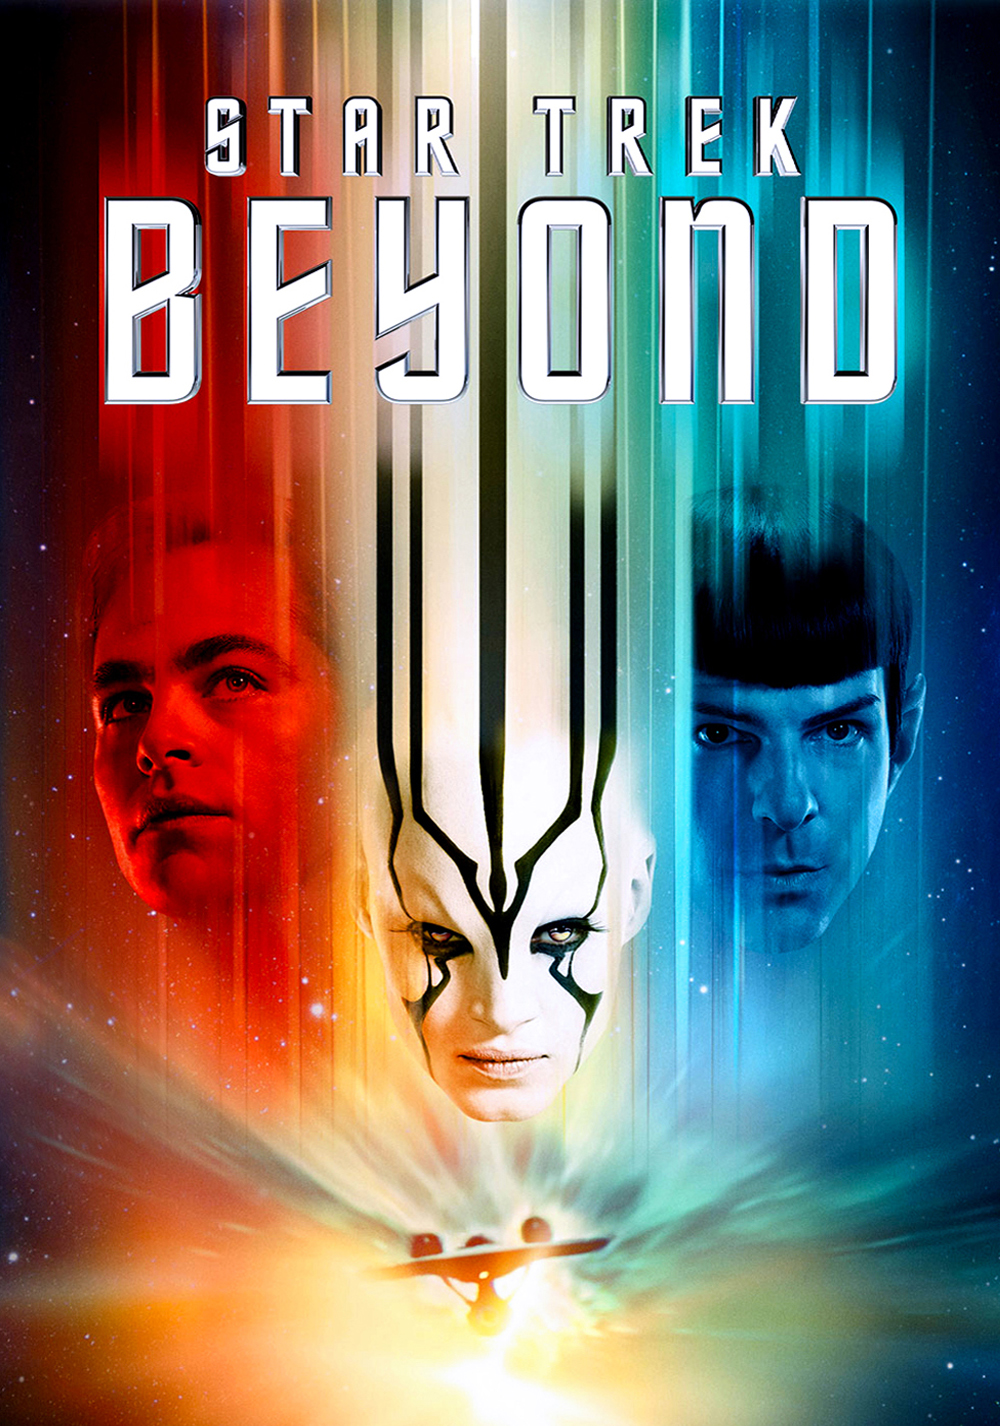 Star Trek Movie Set - wowkeyword.com